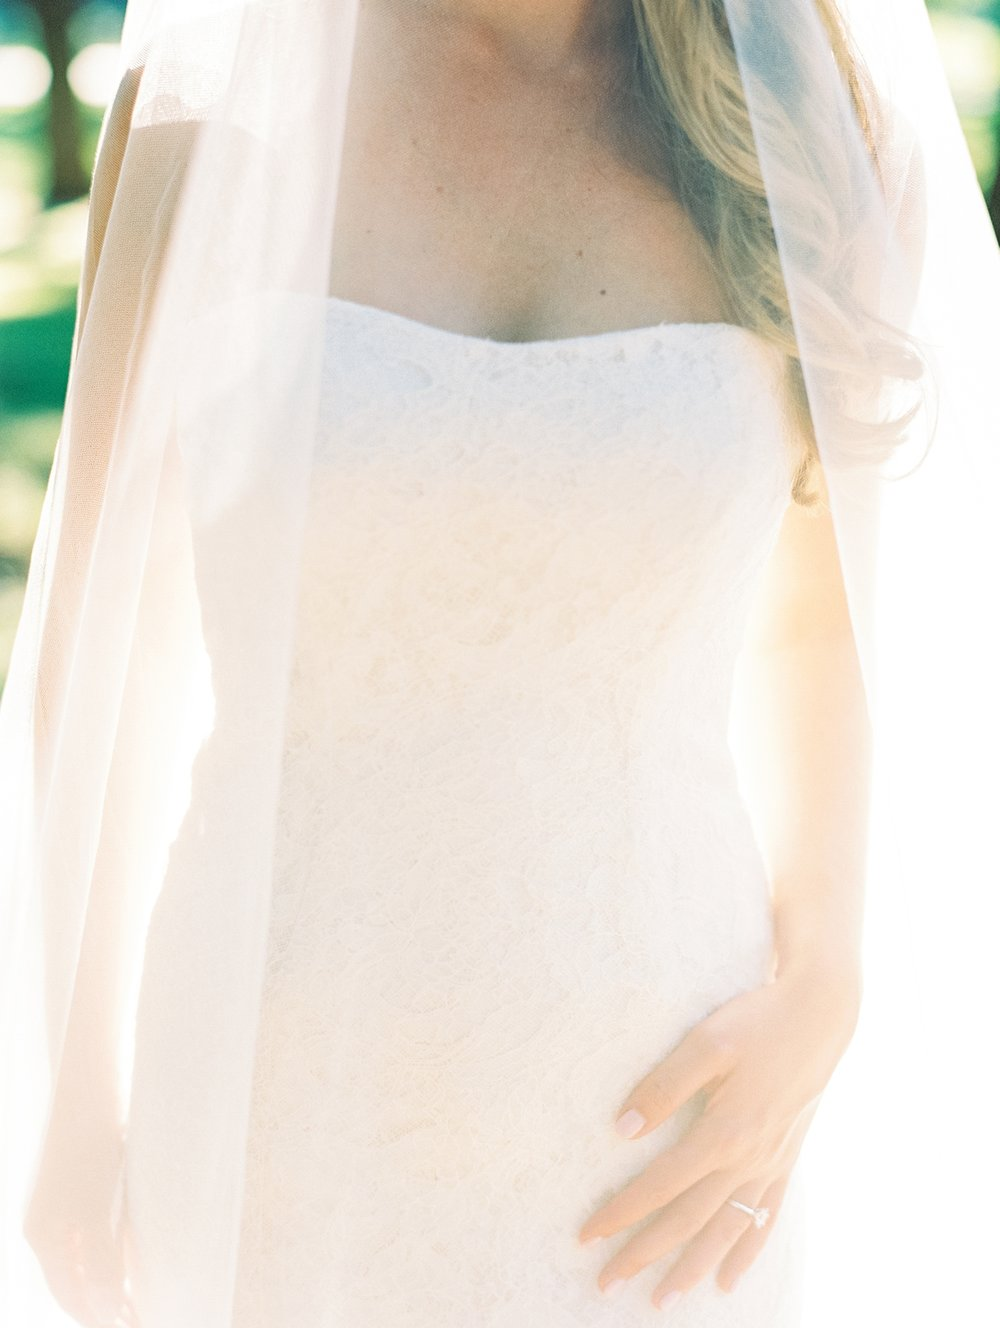 Becca Lea Photography, Fine art film wedding photographer, Contax 645, Portra 400, Dallas Wedding Photographer, Dallas Wedding, DFW Wedding Photographer, Lindsey Brunk Planning & Design, Nardos Design Dallas, The Southern Table florals, Samantha Landis hair and makeup